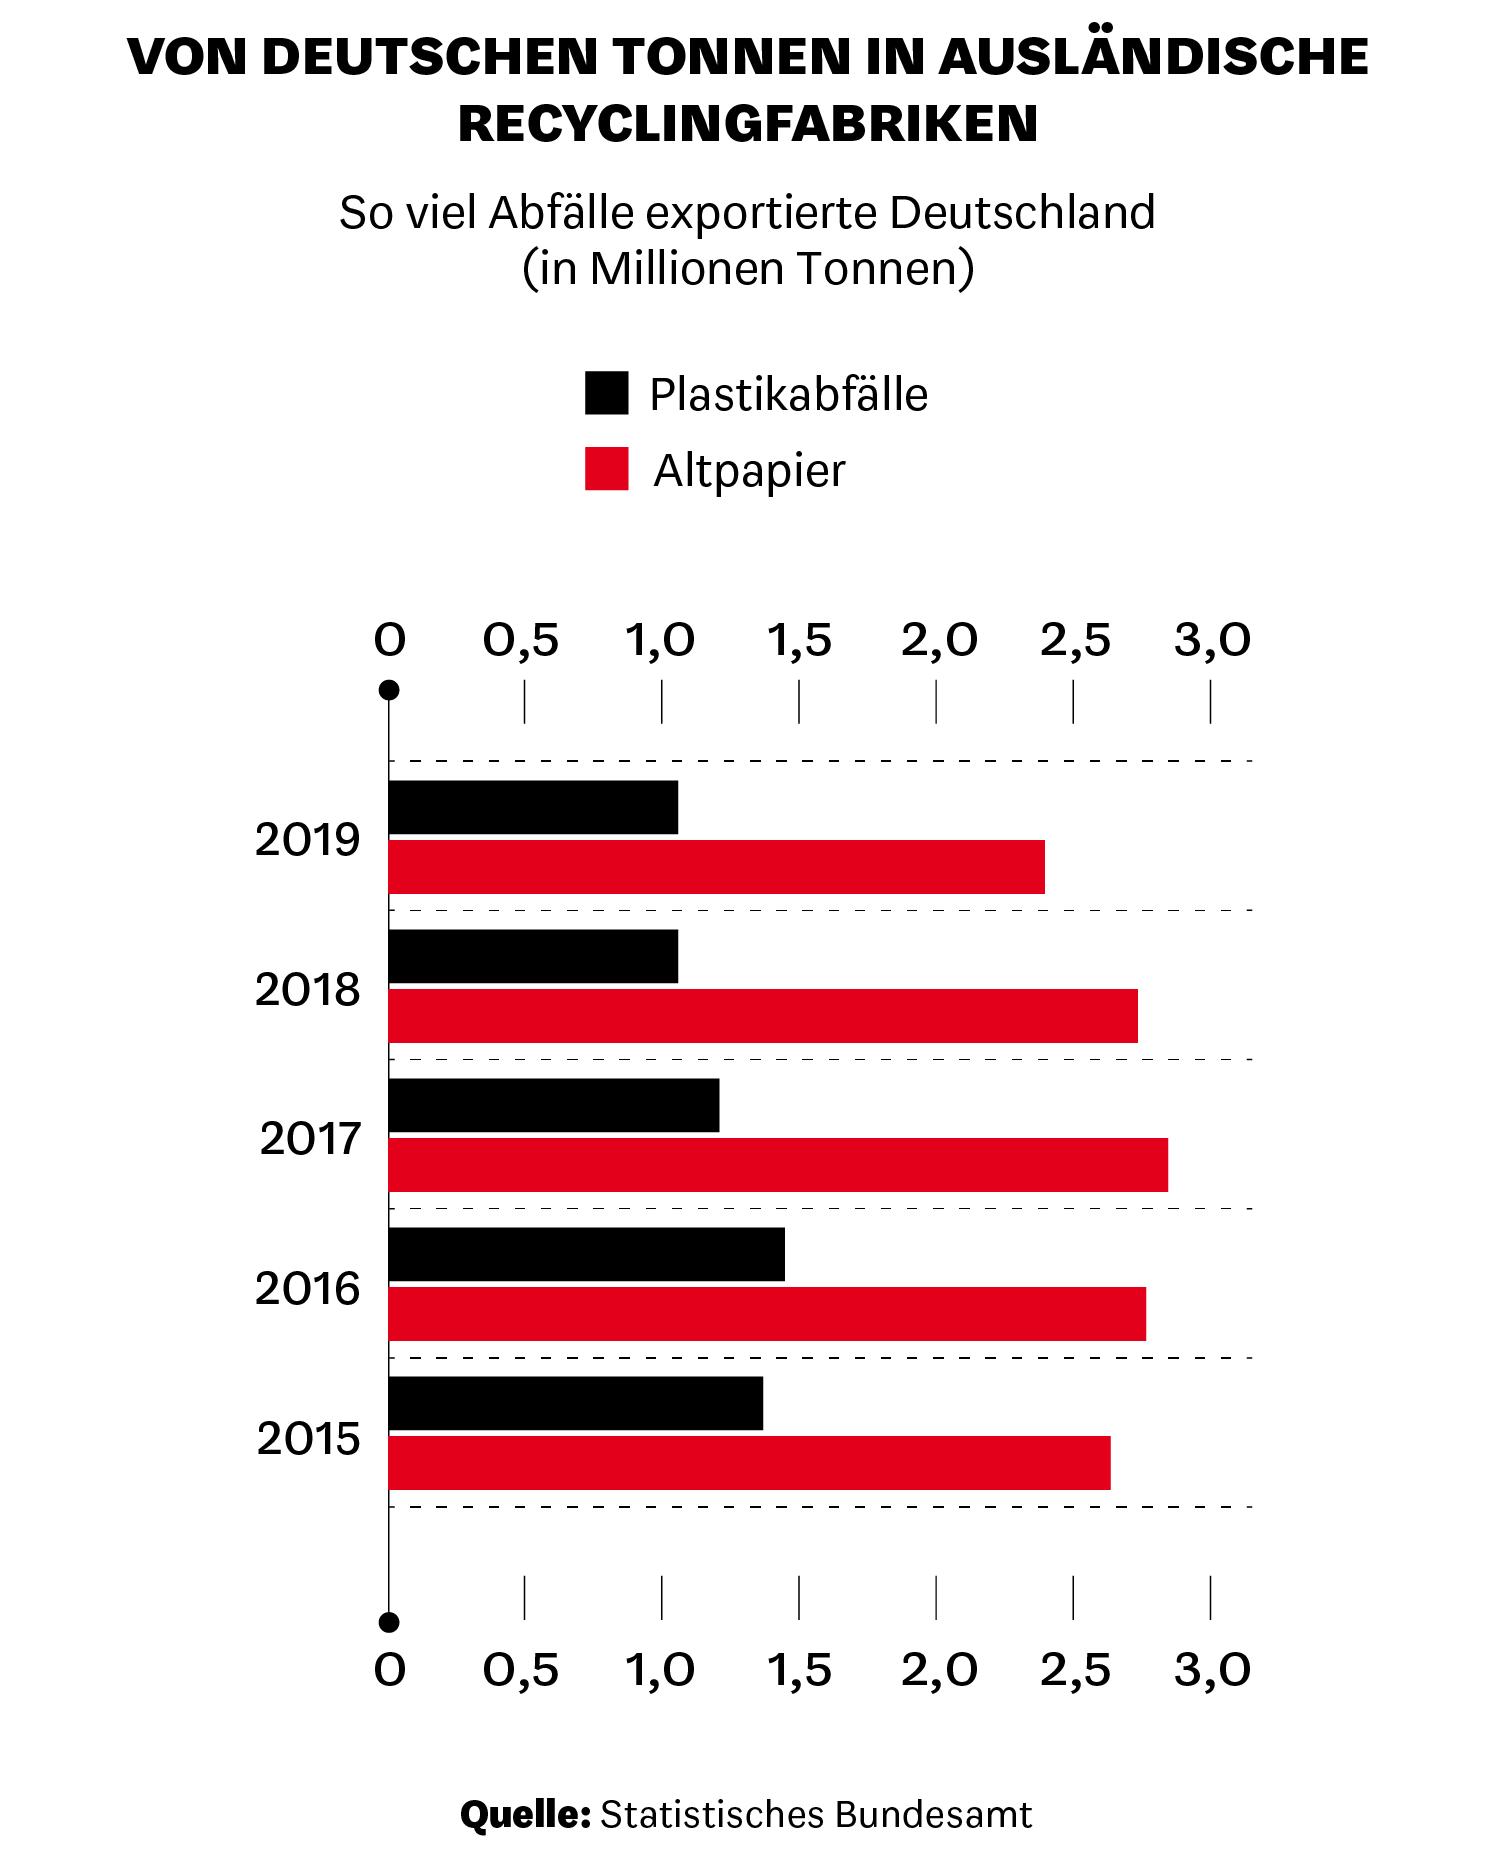 So viel Abfälle exportierte Deutschland